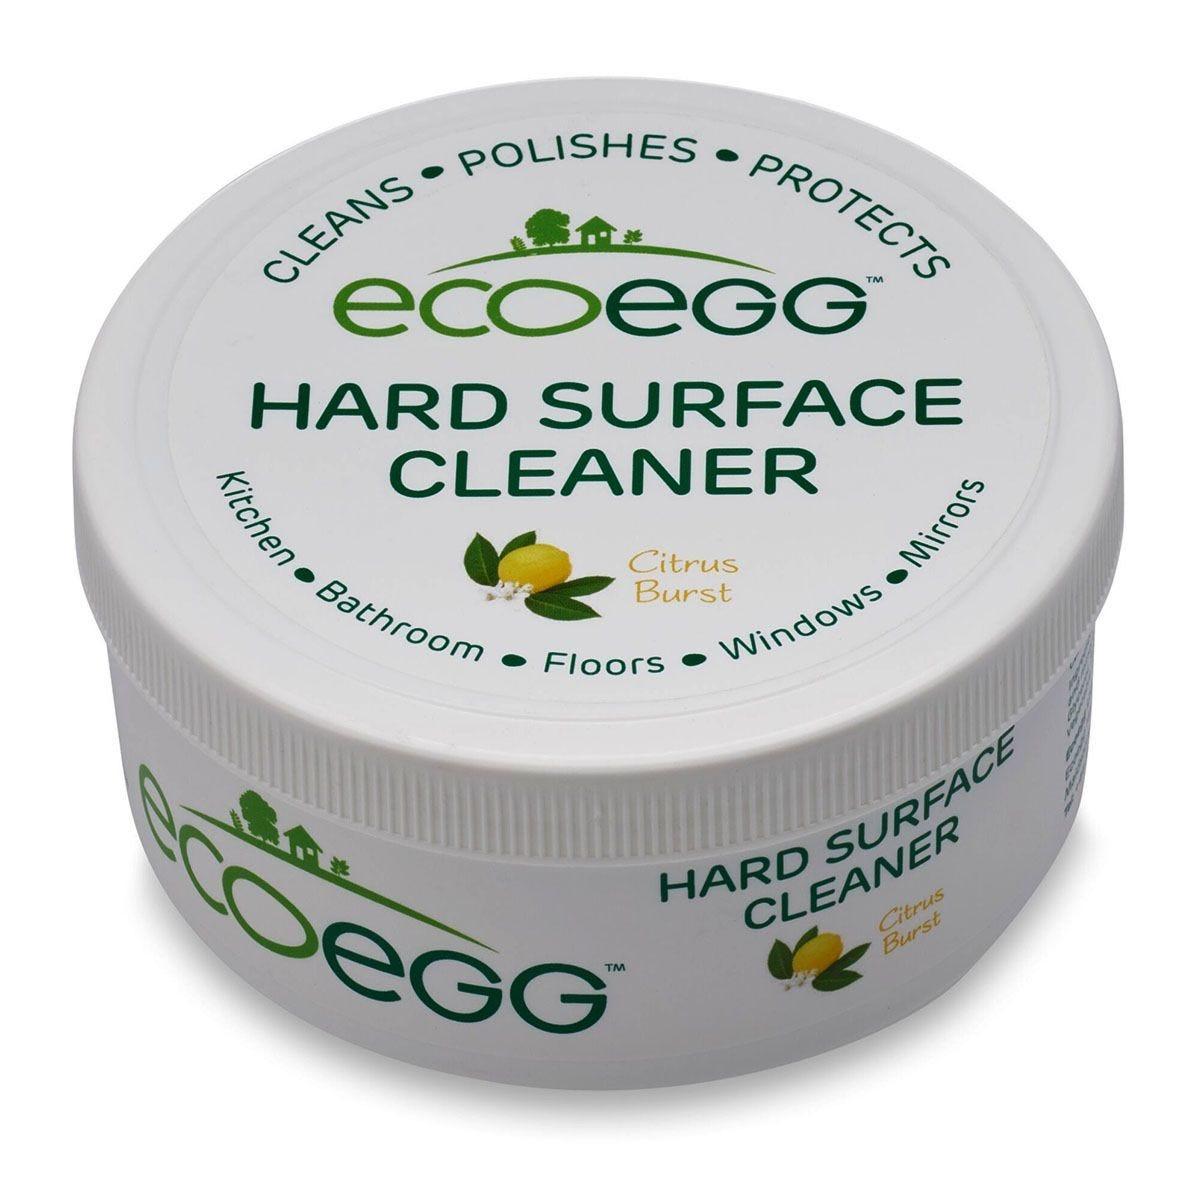 Ecoegg Hard Surface Cleaner - 300g